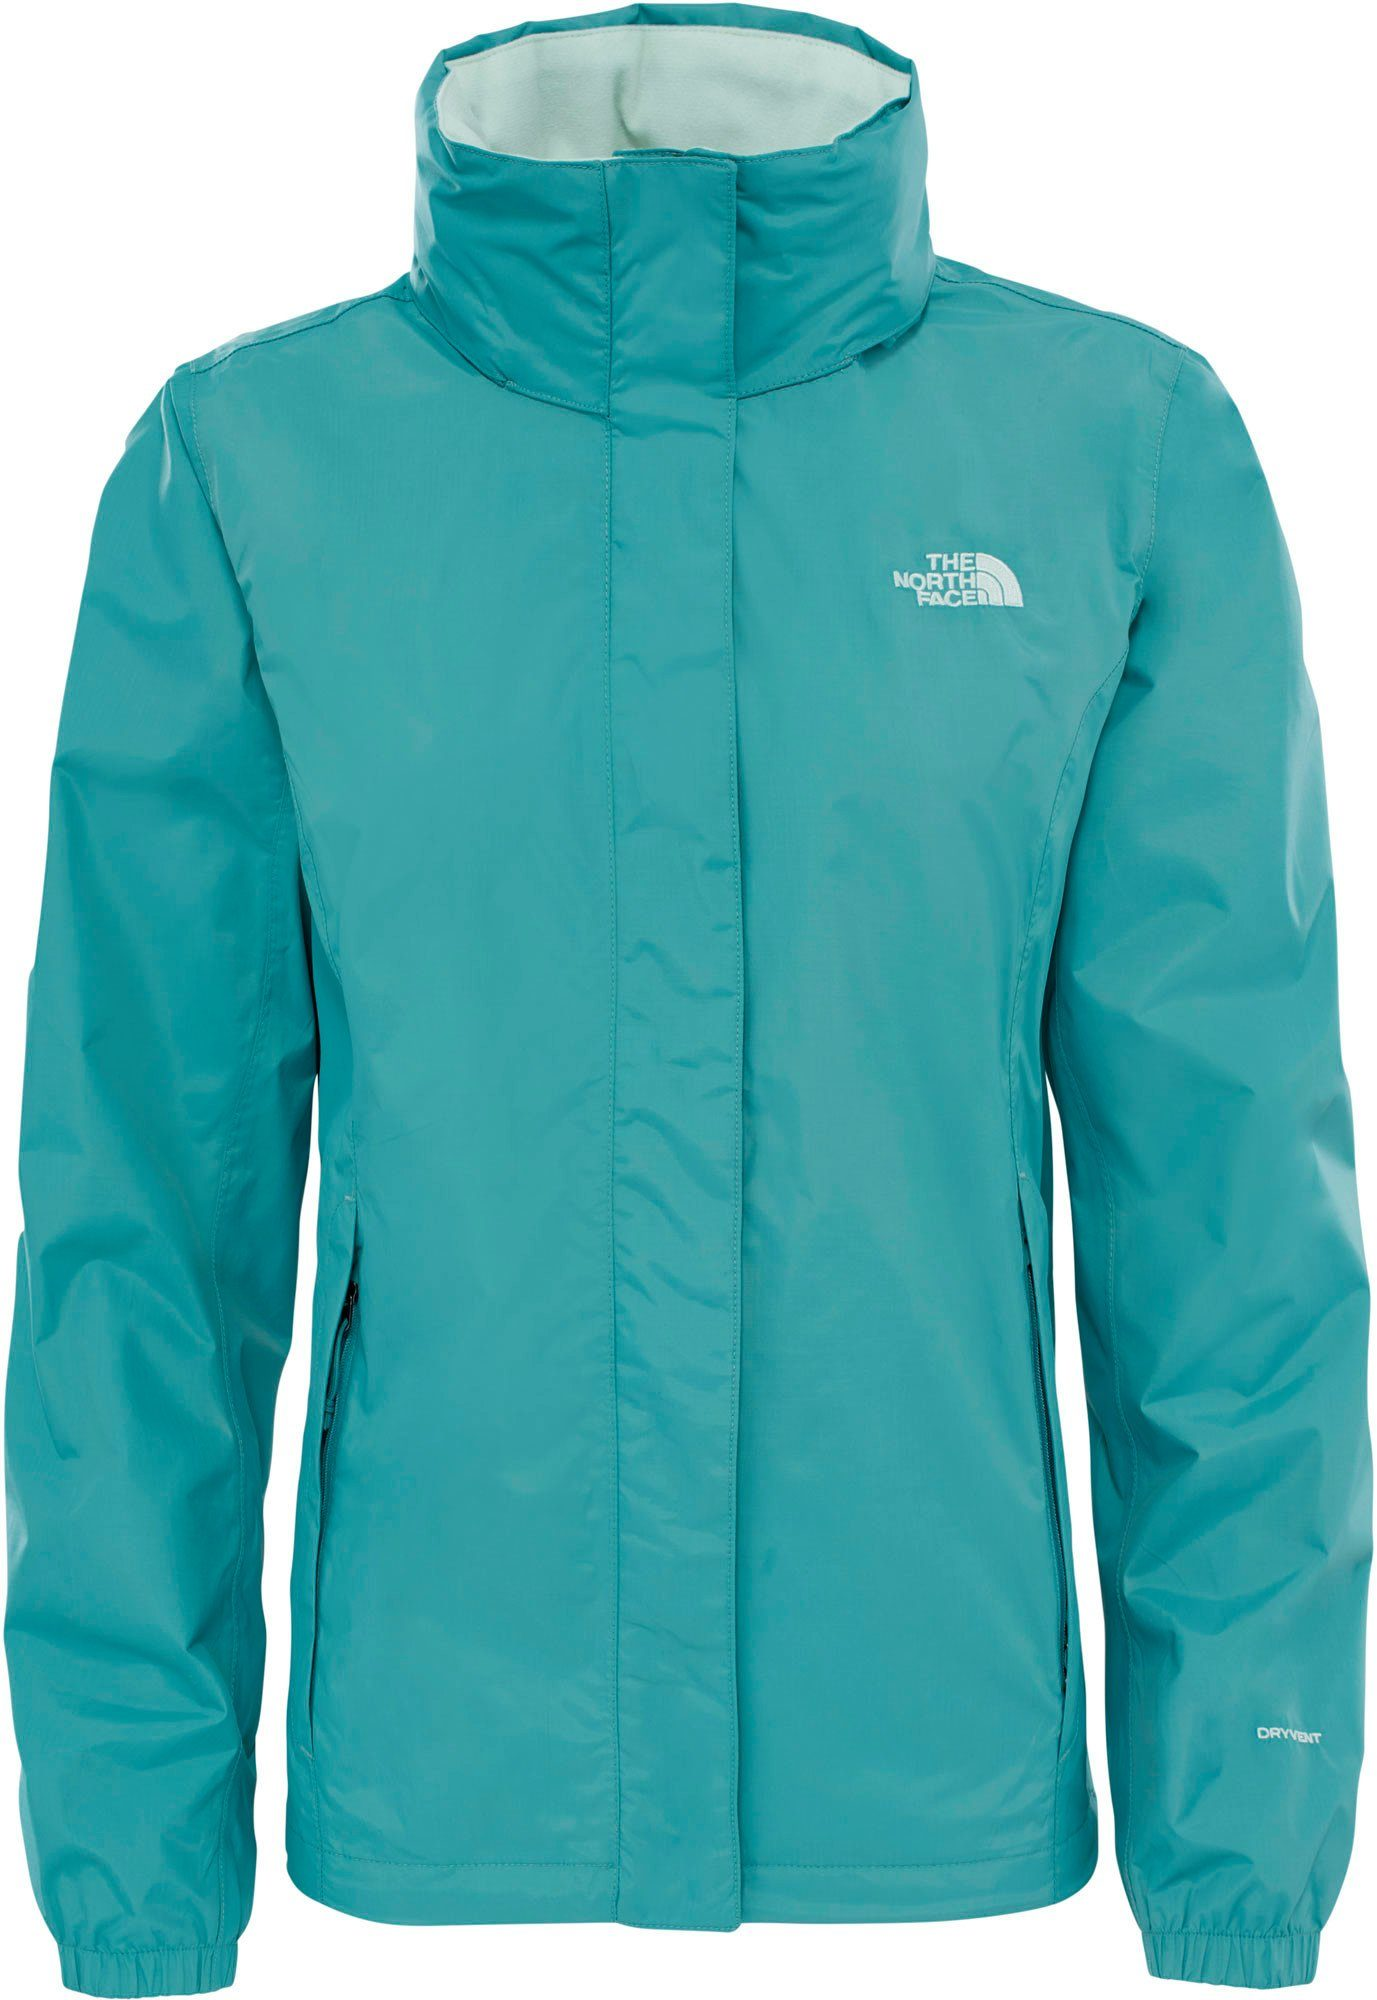 The North Face Outdoorjacke »Resolve 2 Jacket Women«